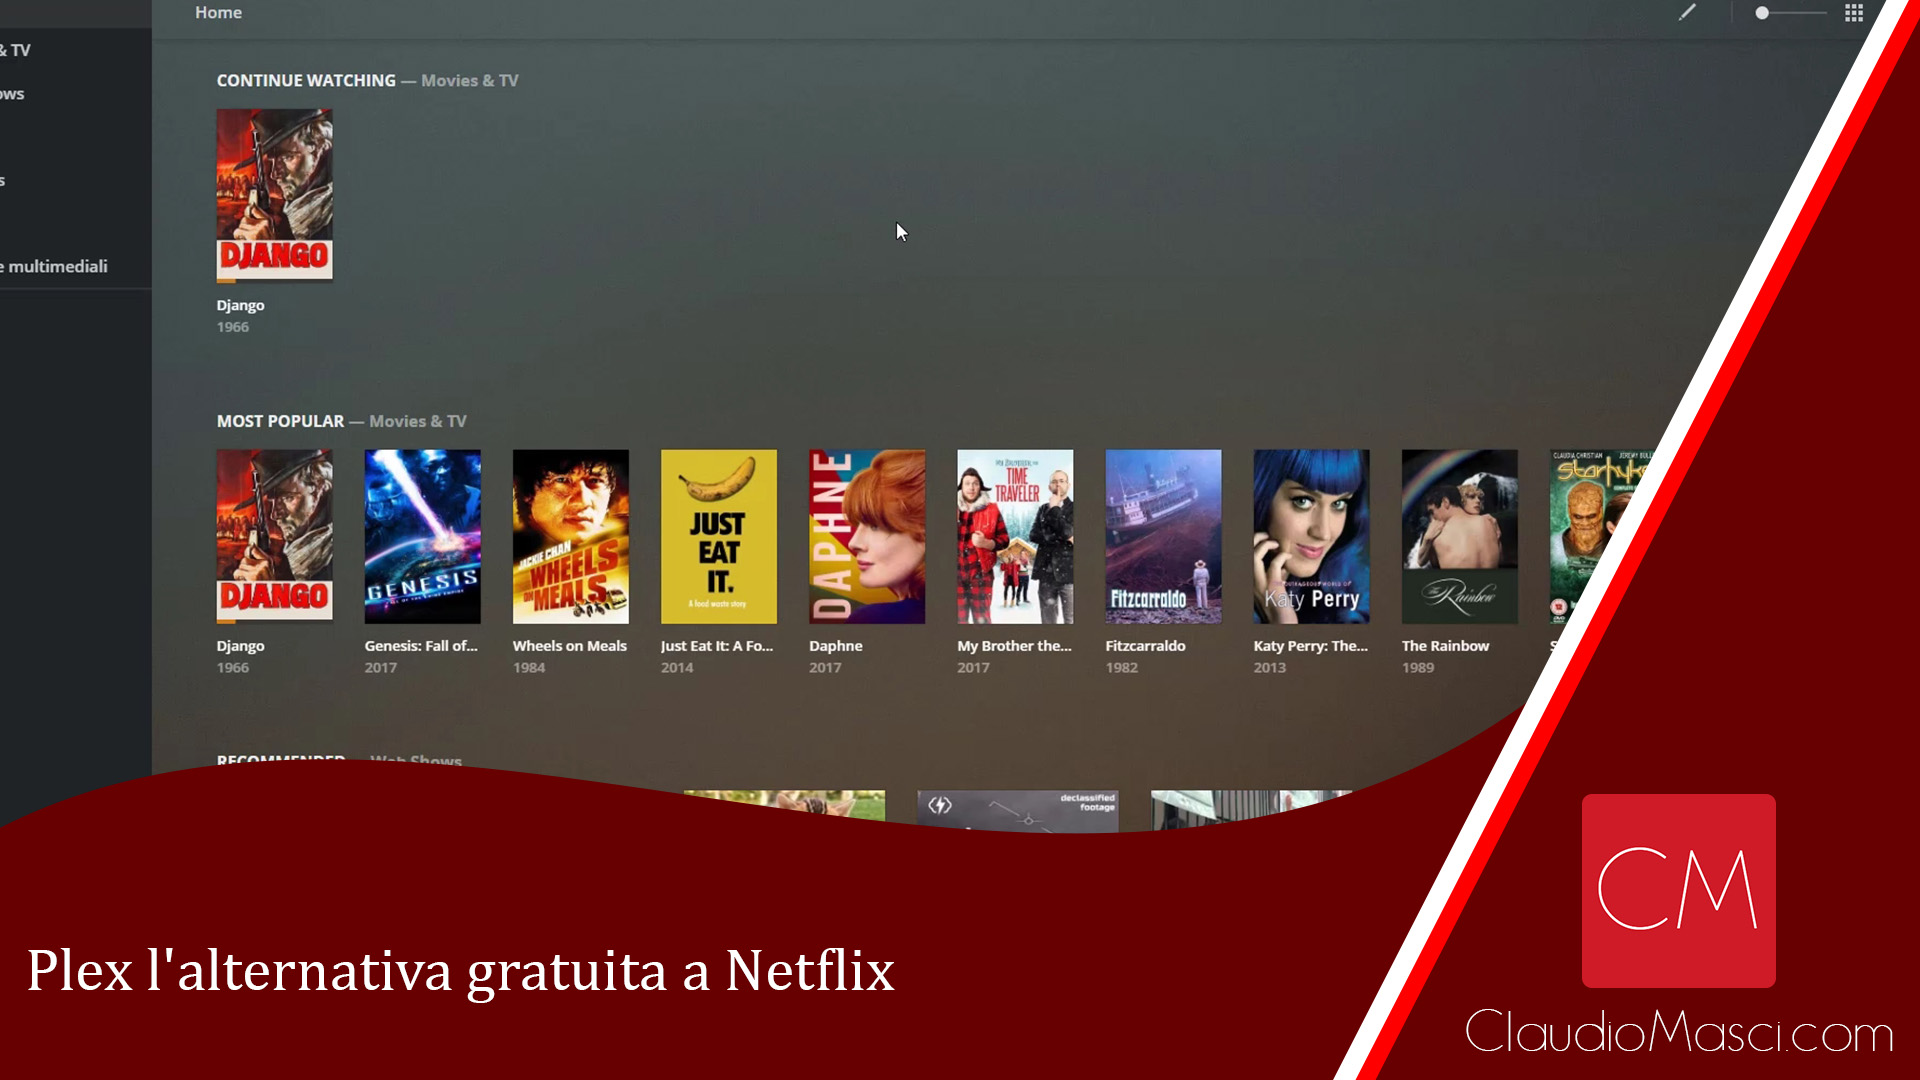 Plex l'alternativa gratuita a Netflix